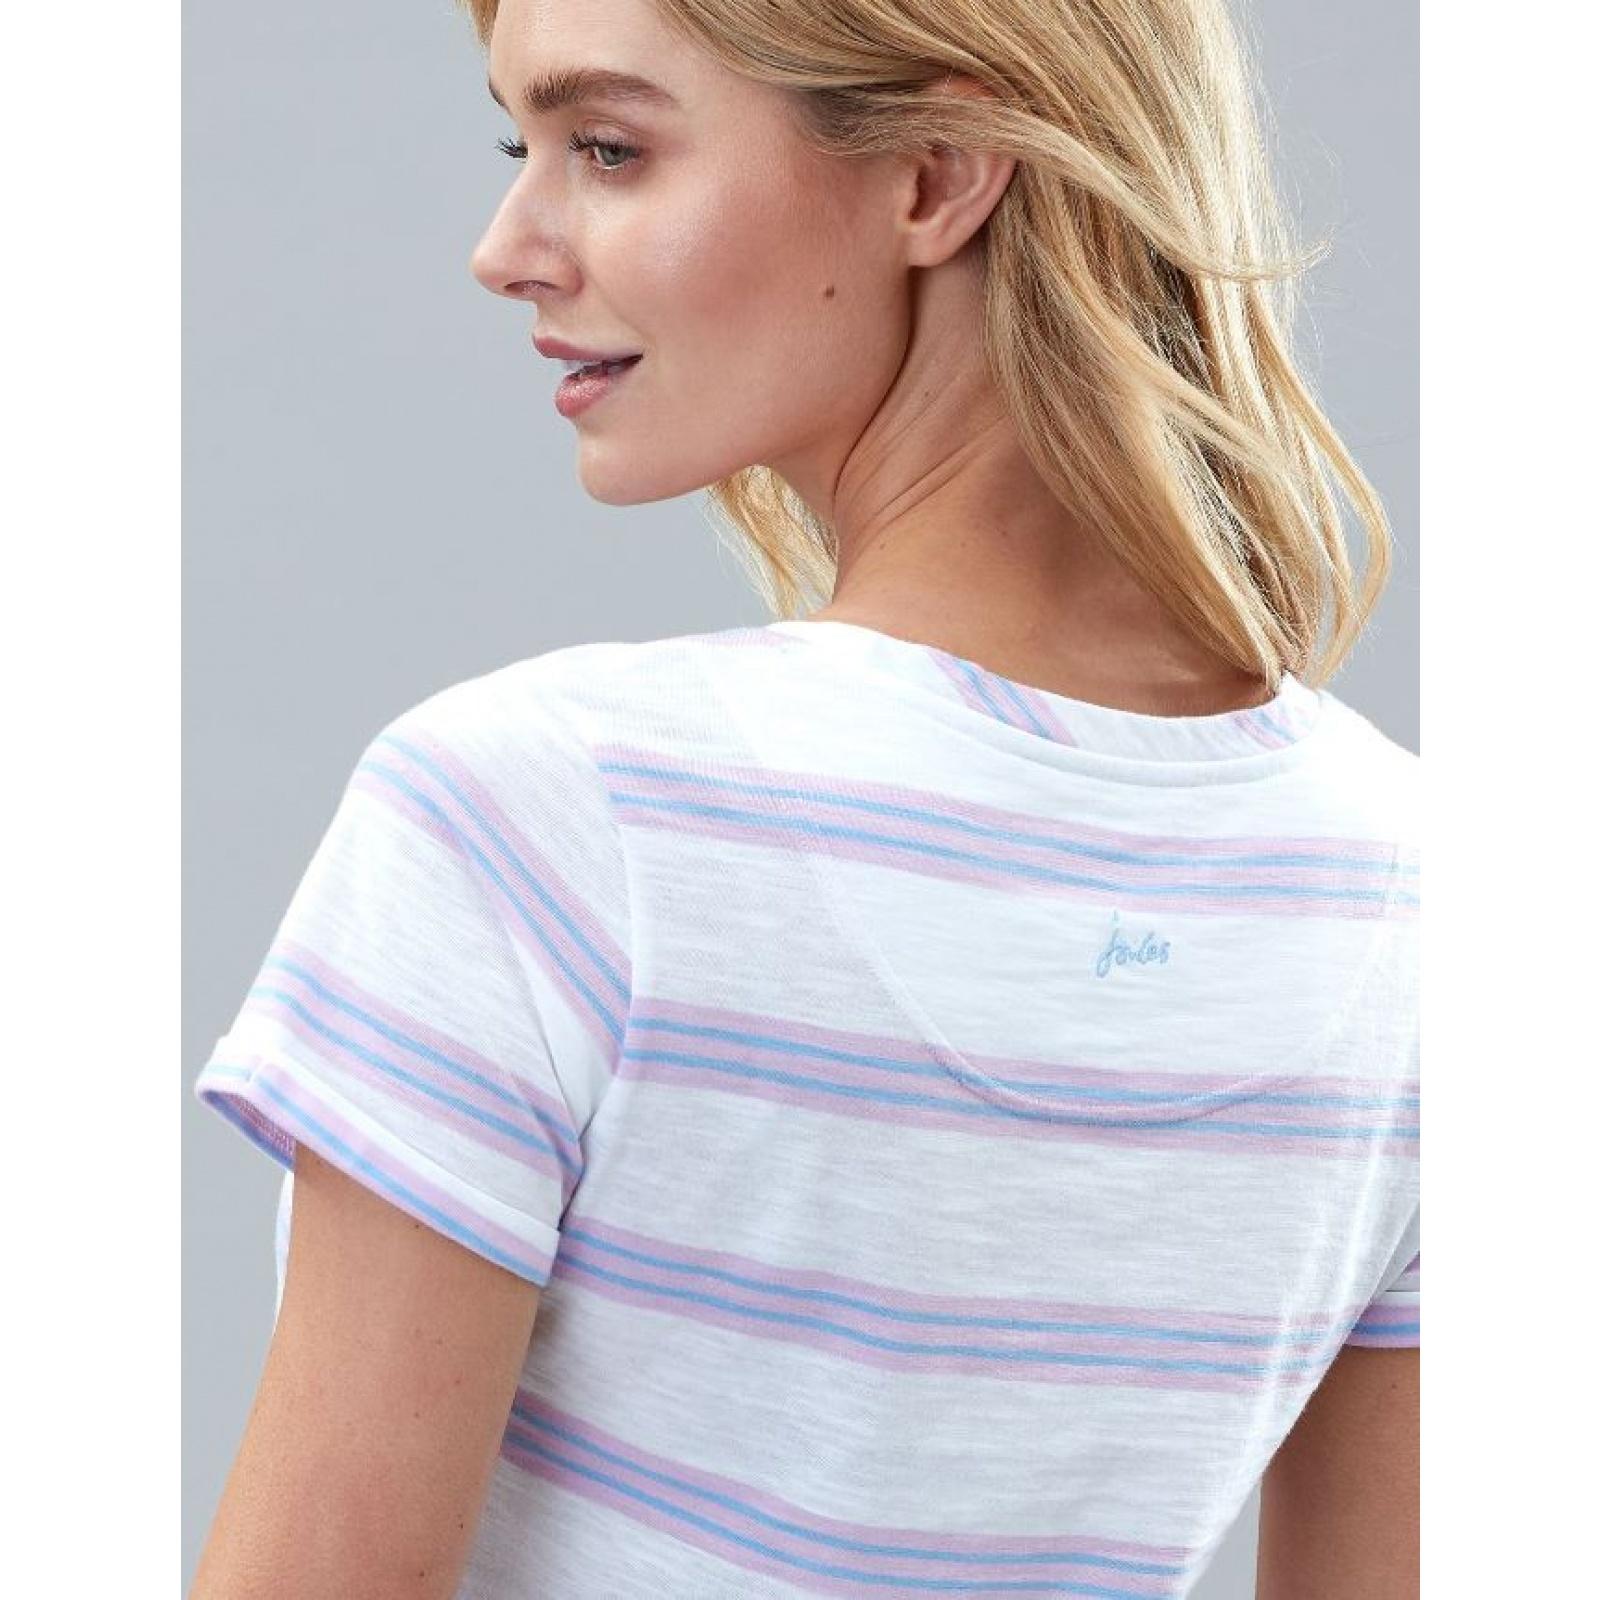 Joules-Nessa-Raya-Ligero-Jersey-Camiseta-SS19 miniatura 11